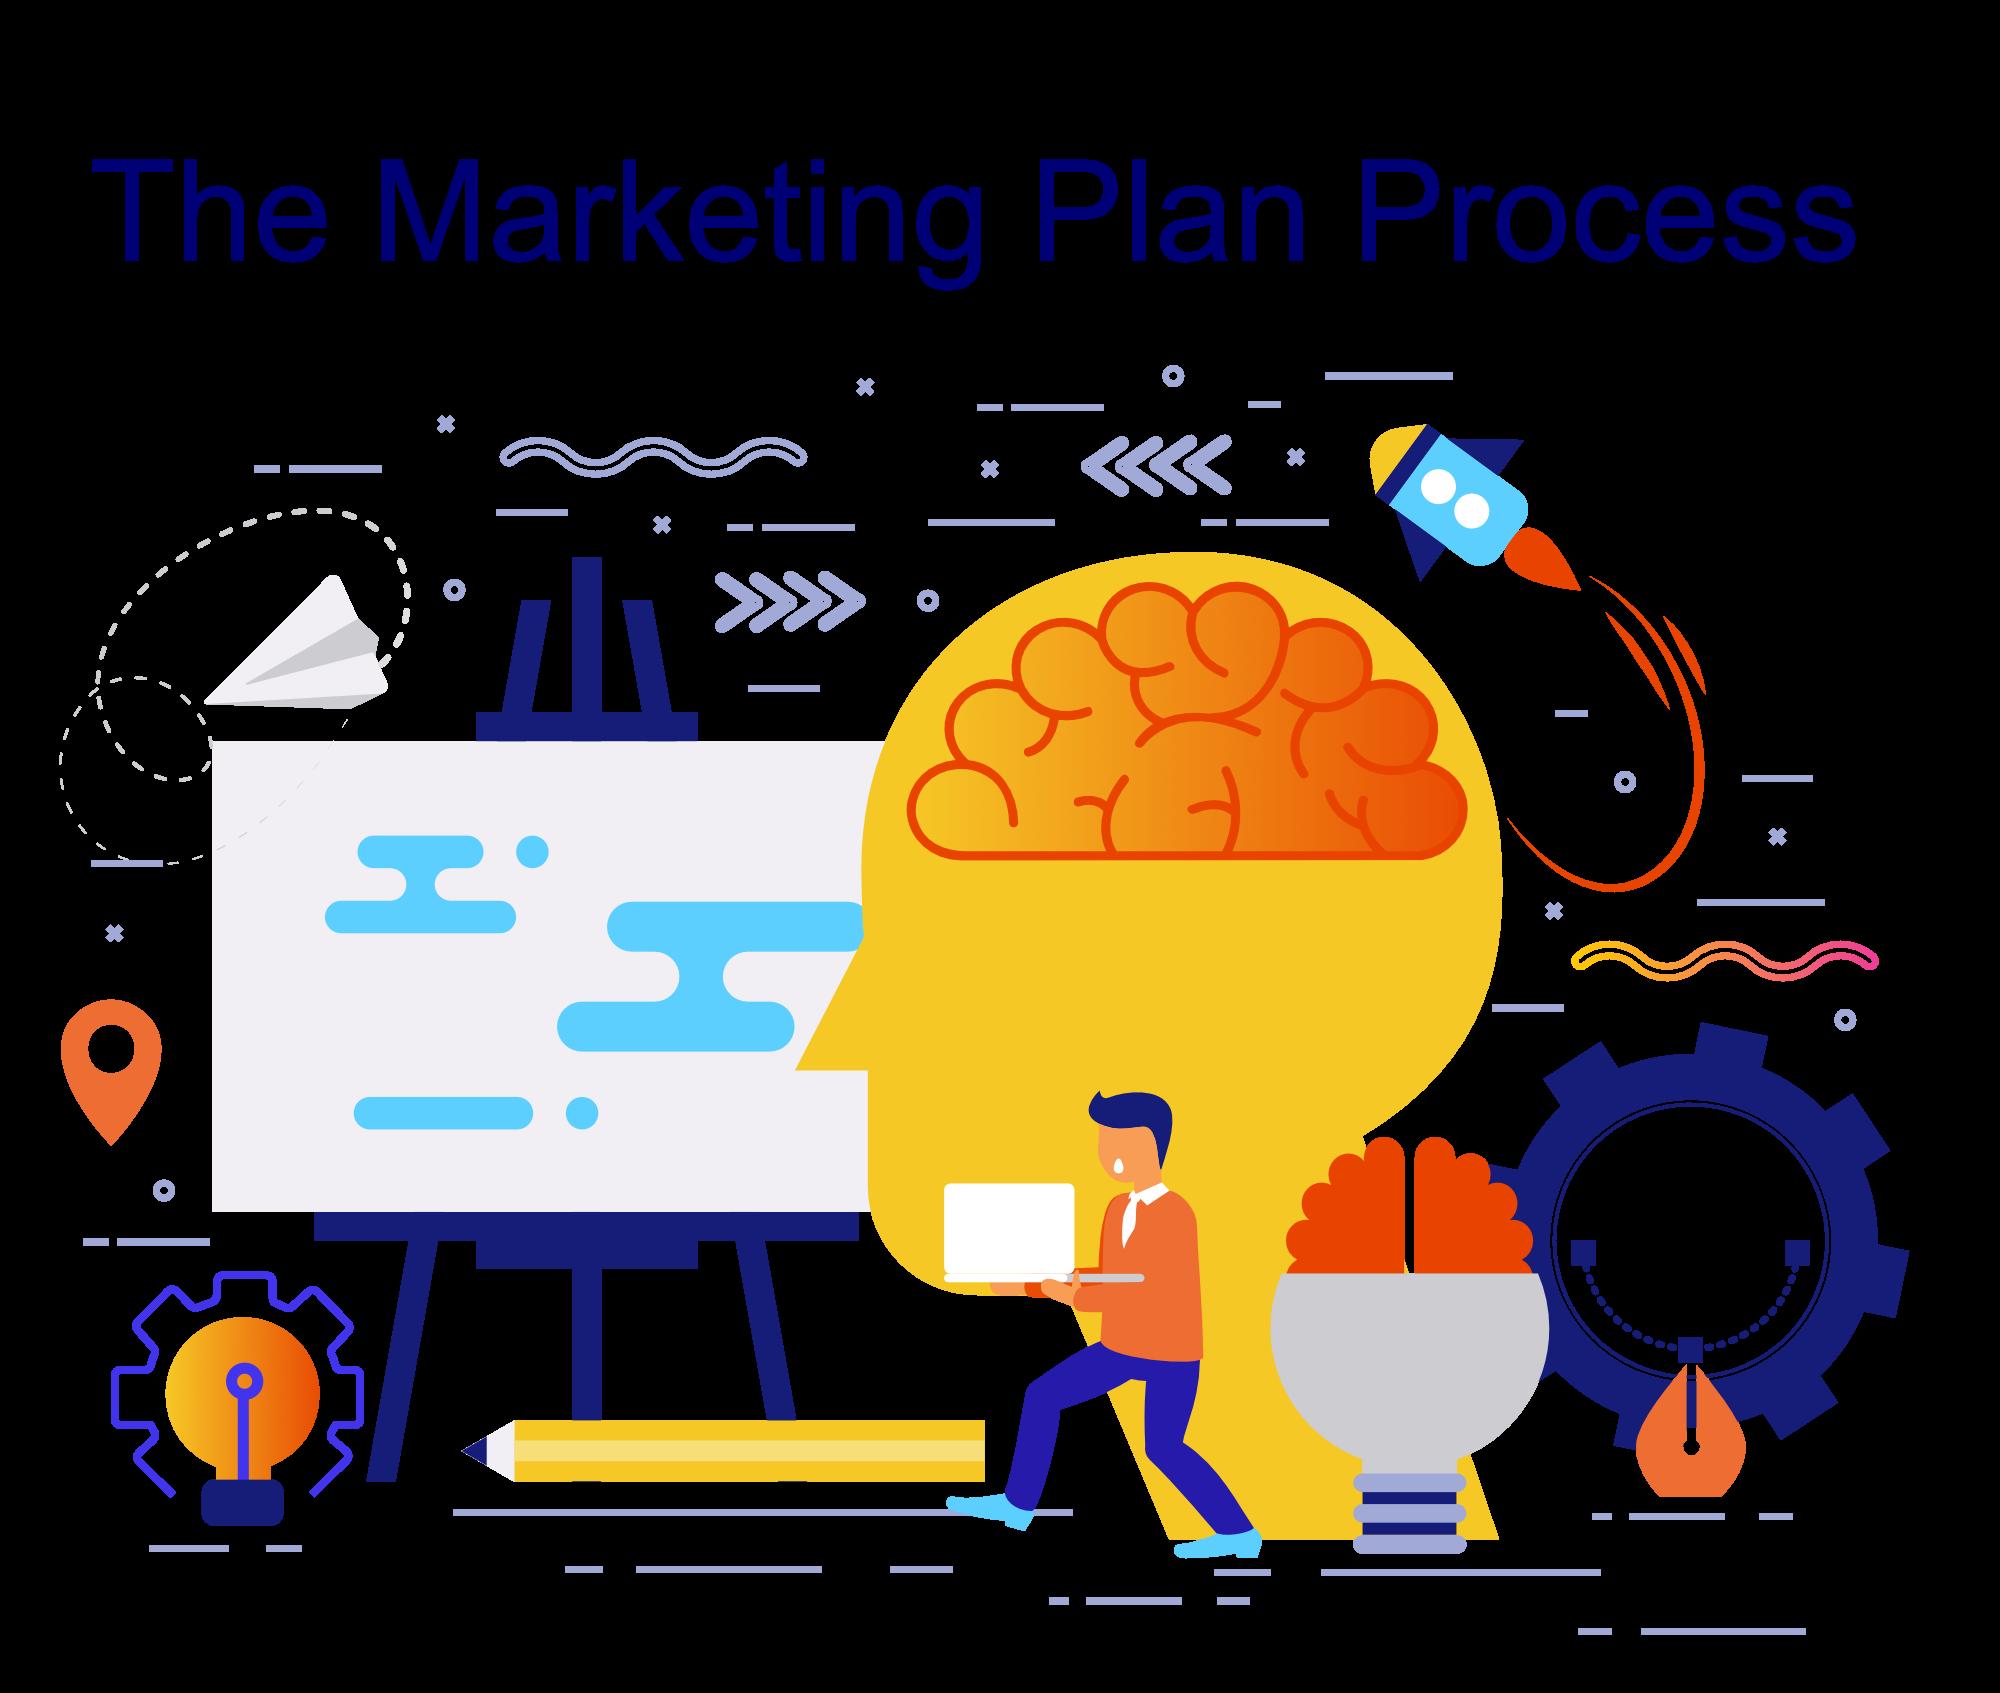 The marketing plan process